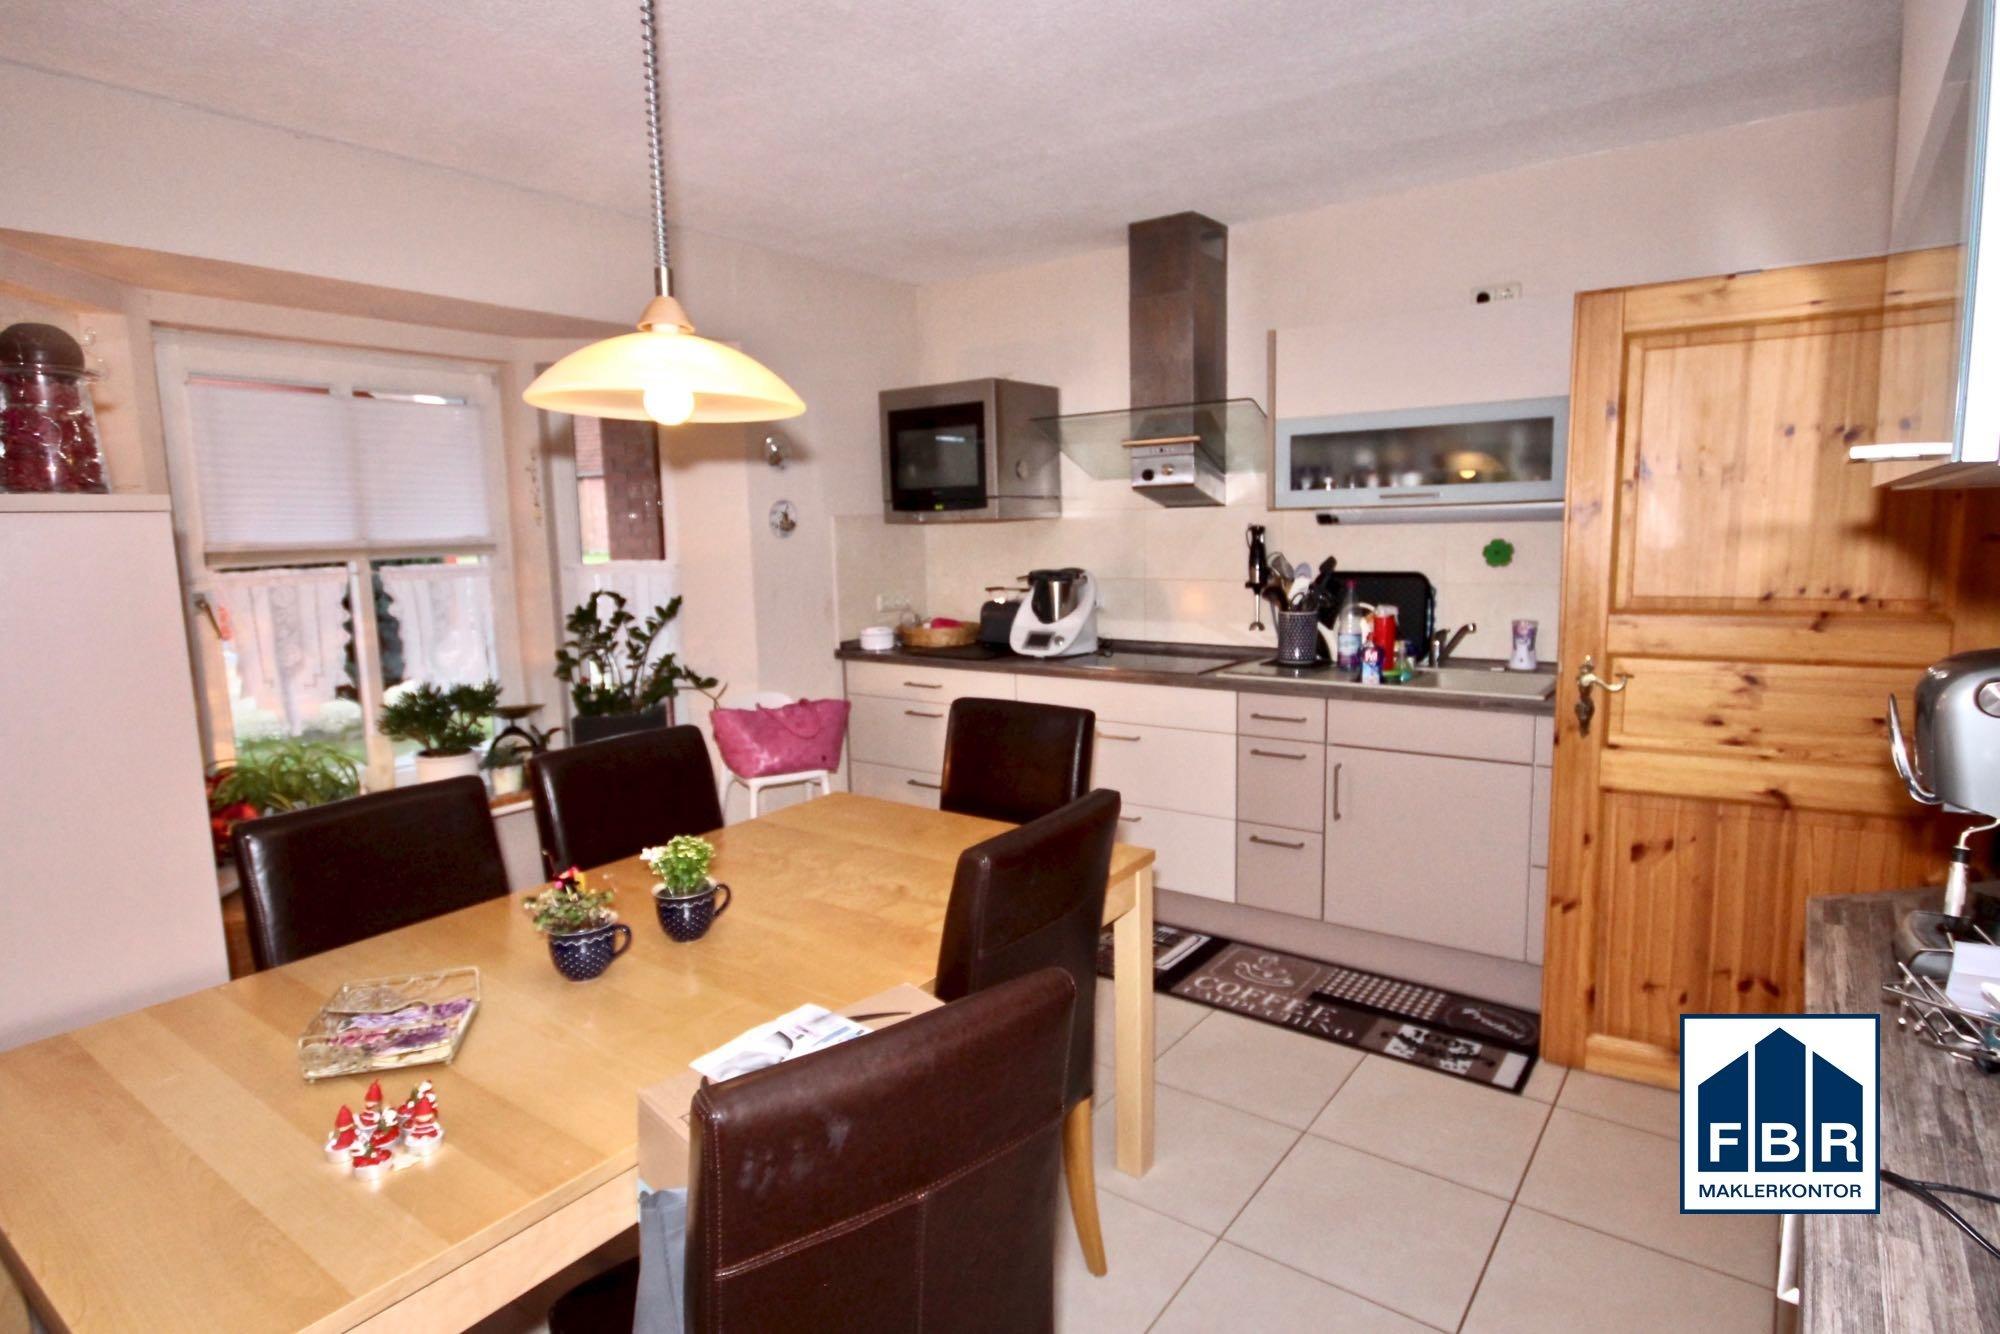 Küche mit Erker im Erdgeschoss